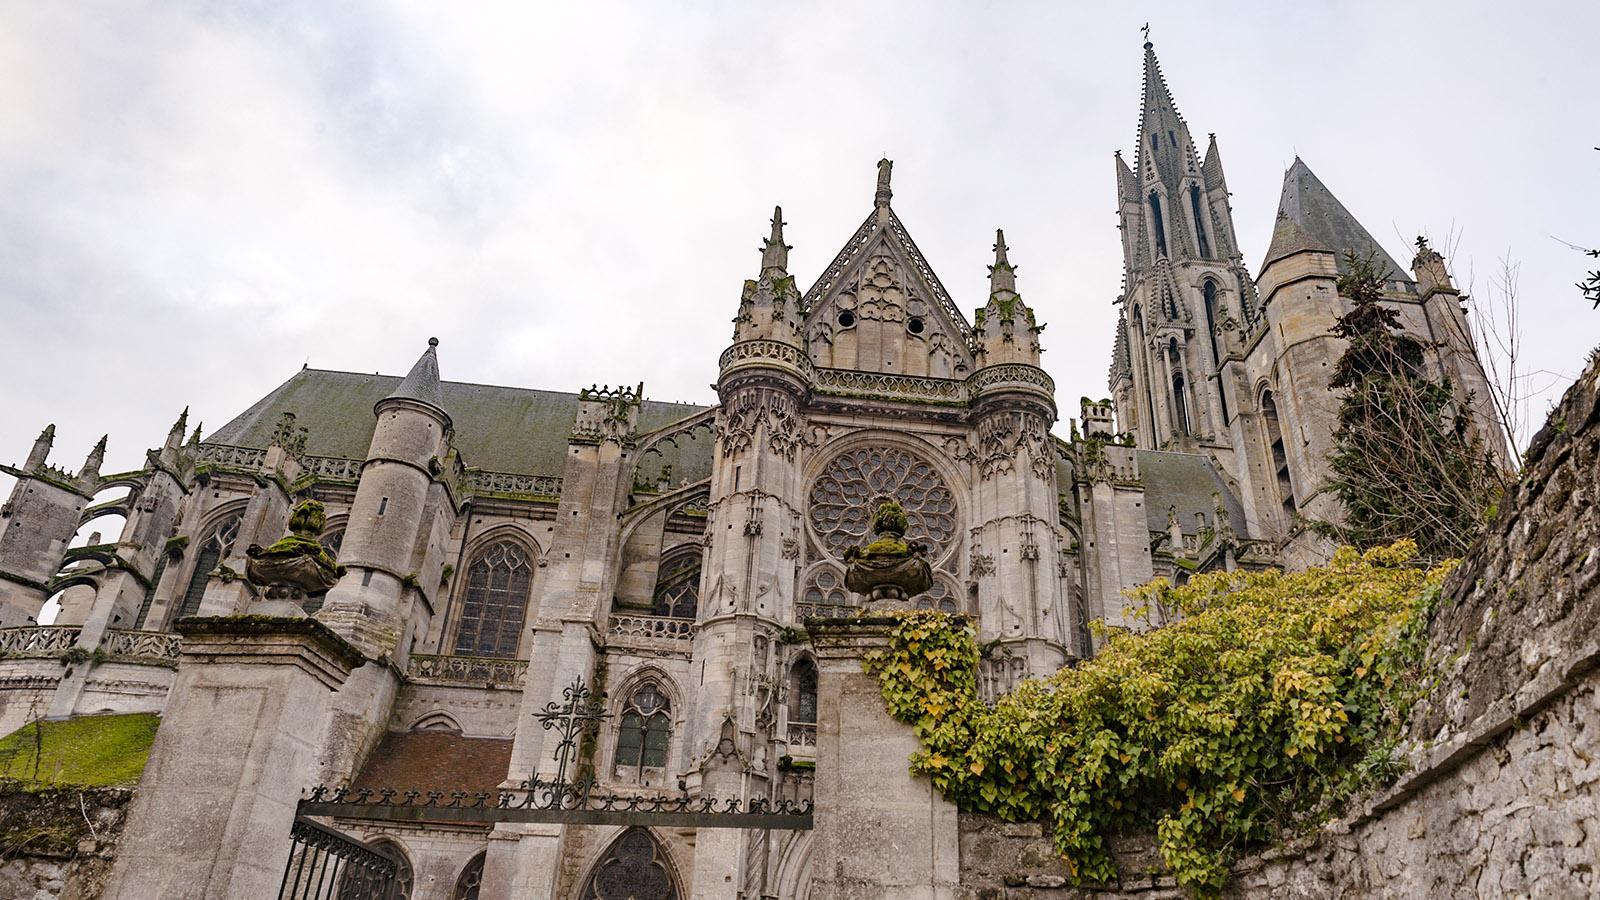 Kinoreife Kulisse: die Kathedrale von Senlis. Foto: Hilke Maunder